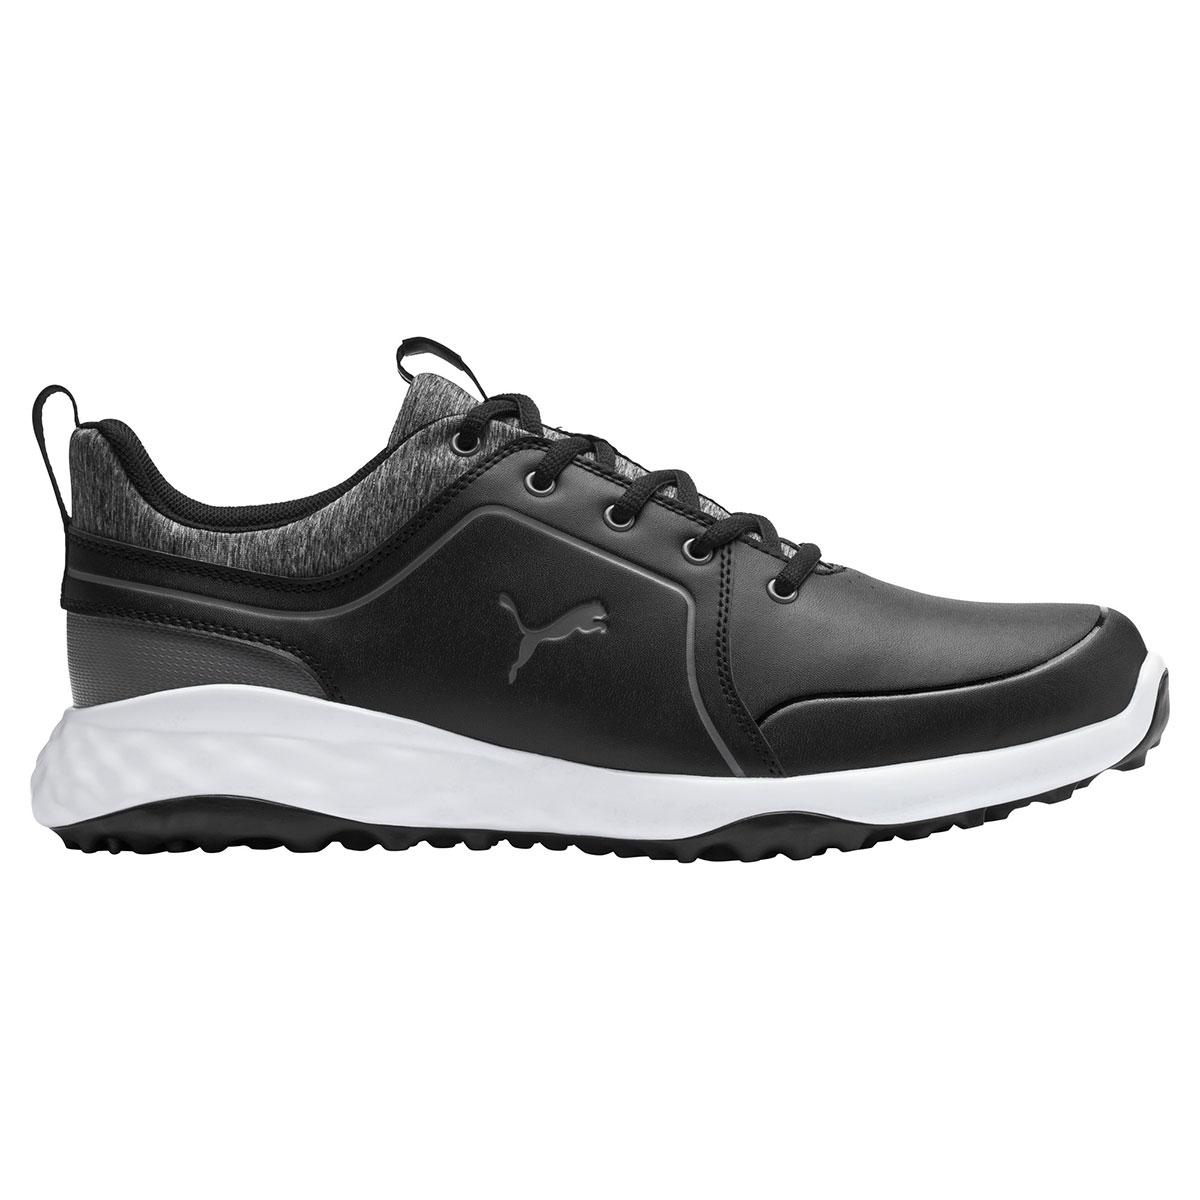 puma lightweight shoes